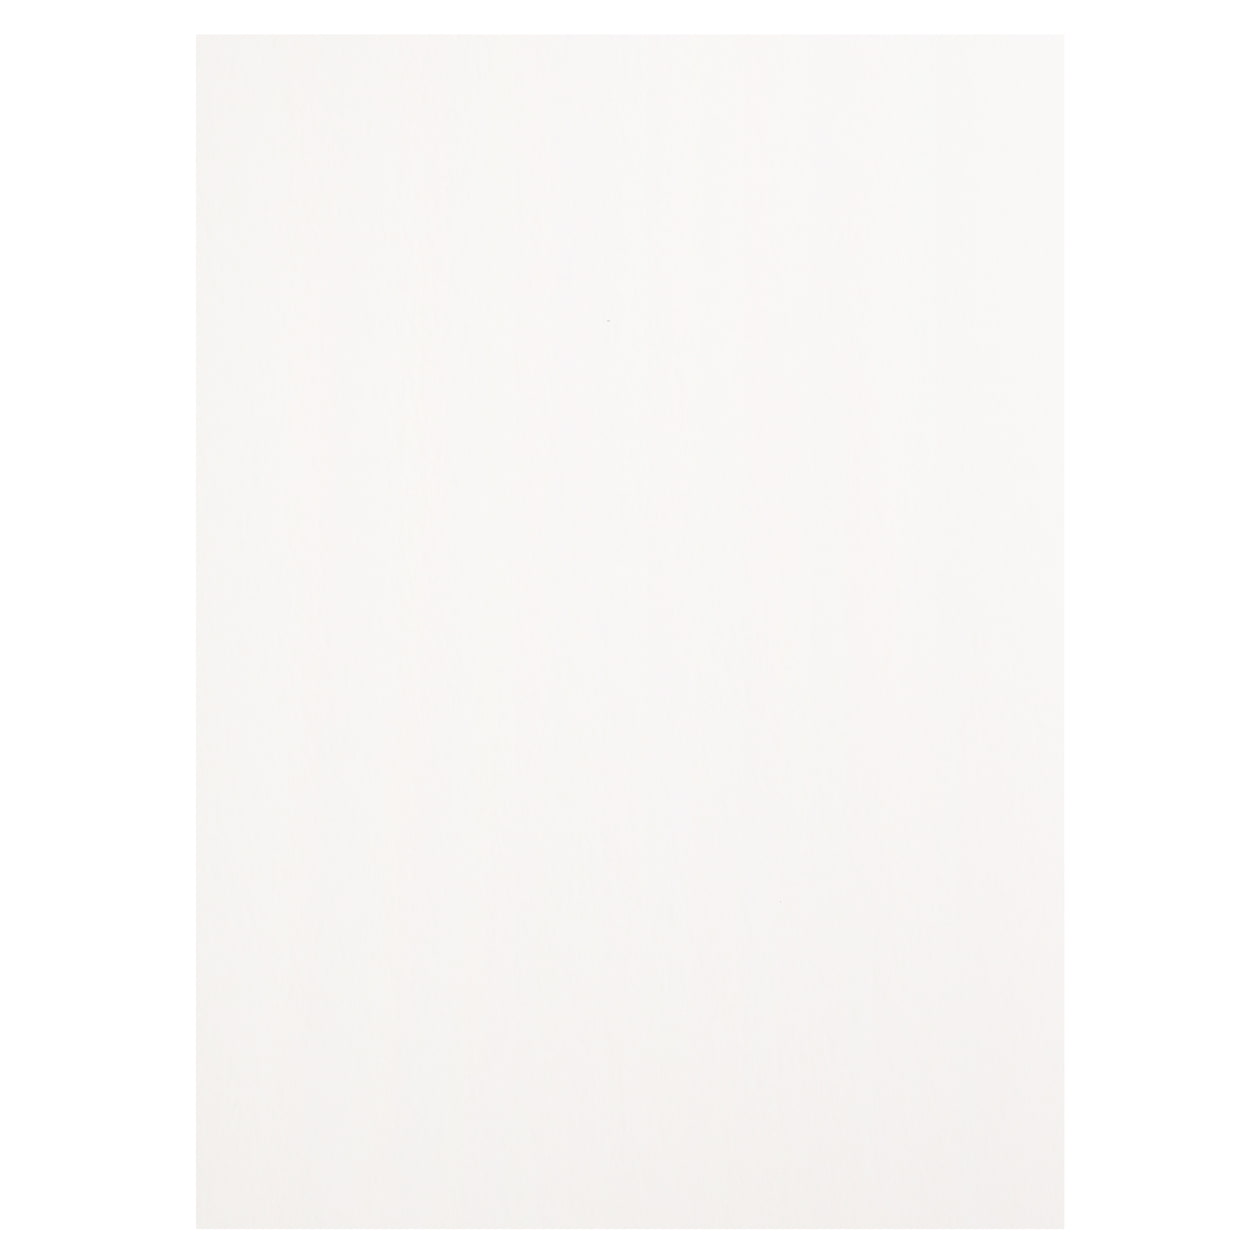 A4カード+α HAGURUMA Basic プレインホワイト 260g